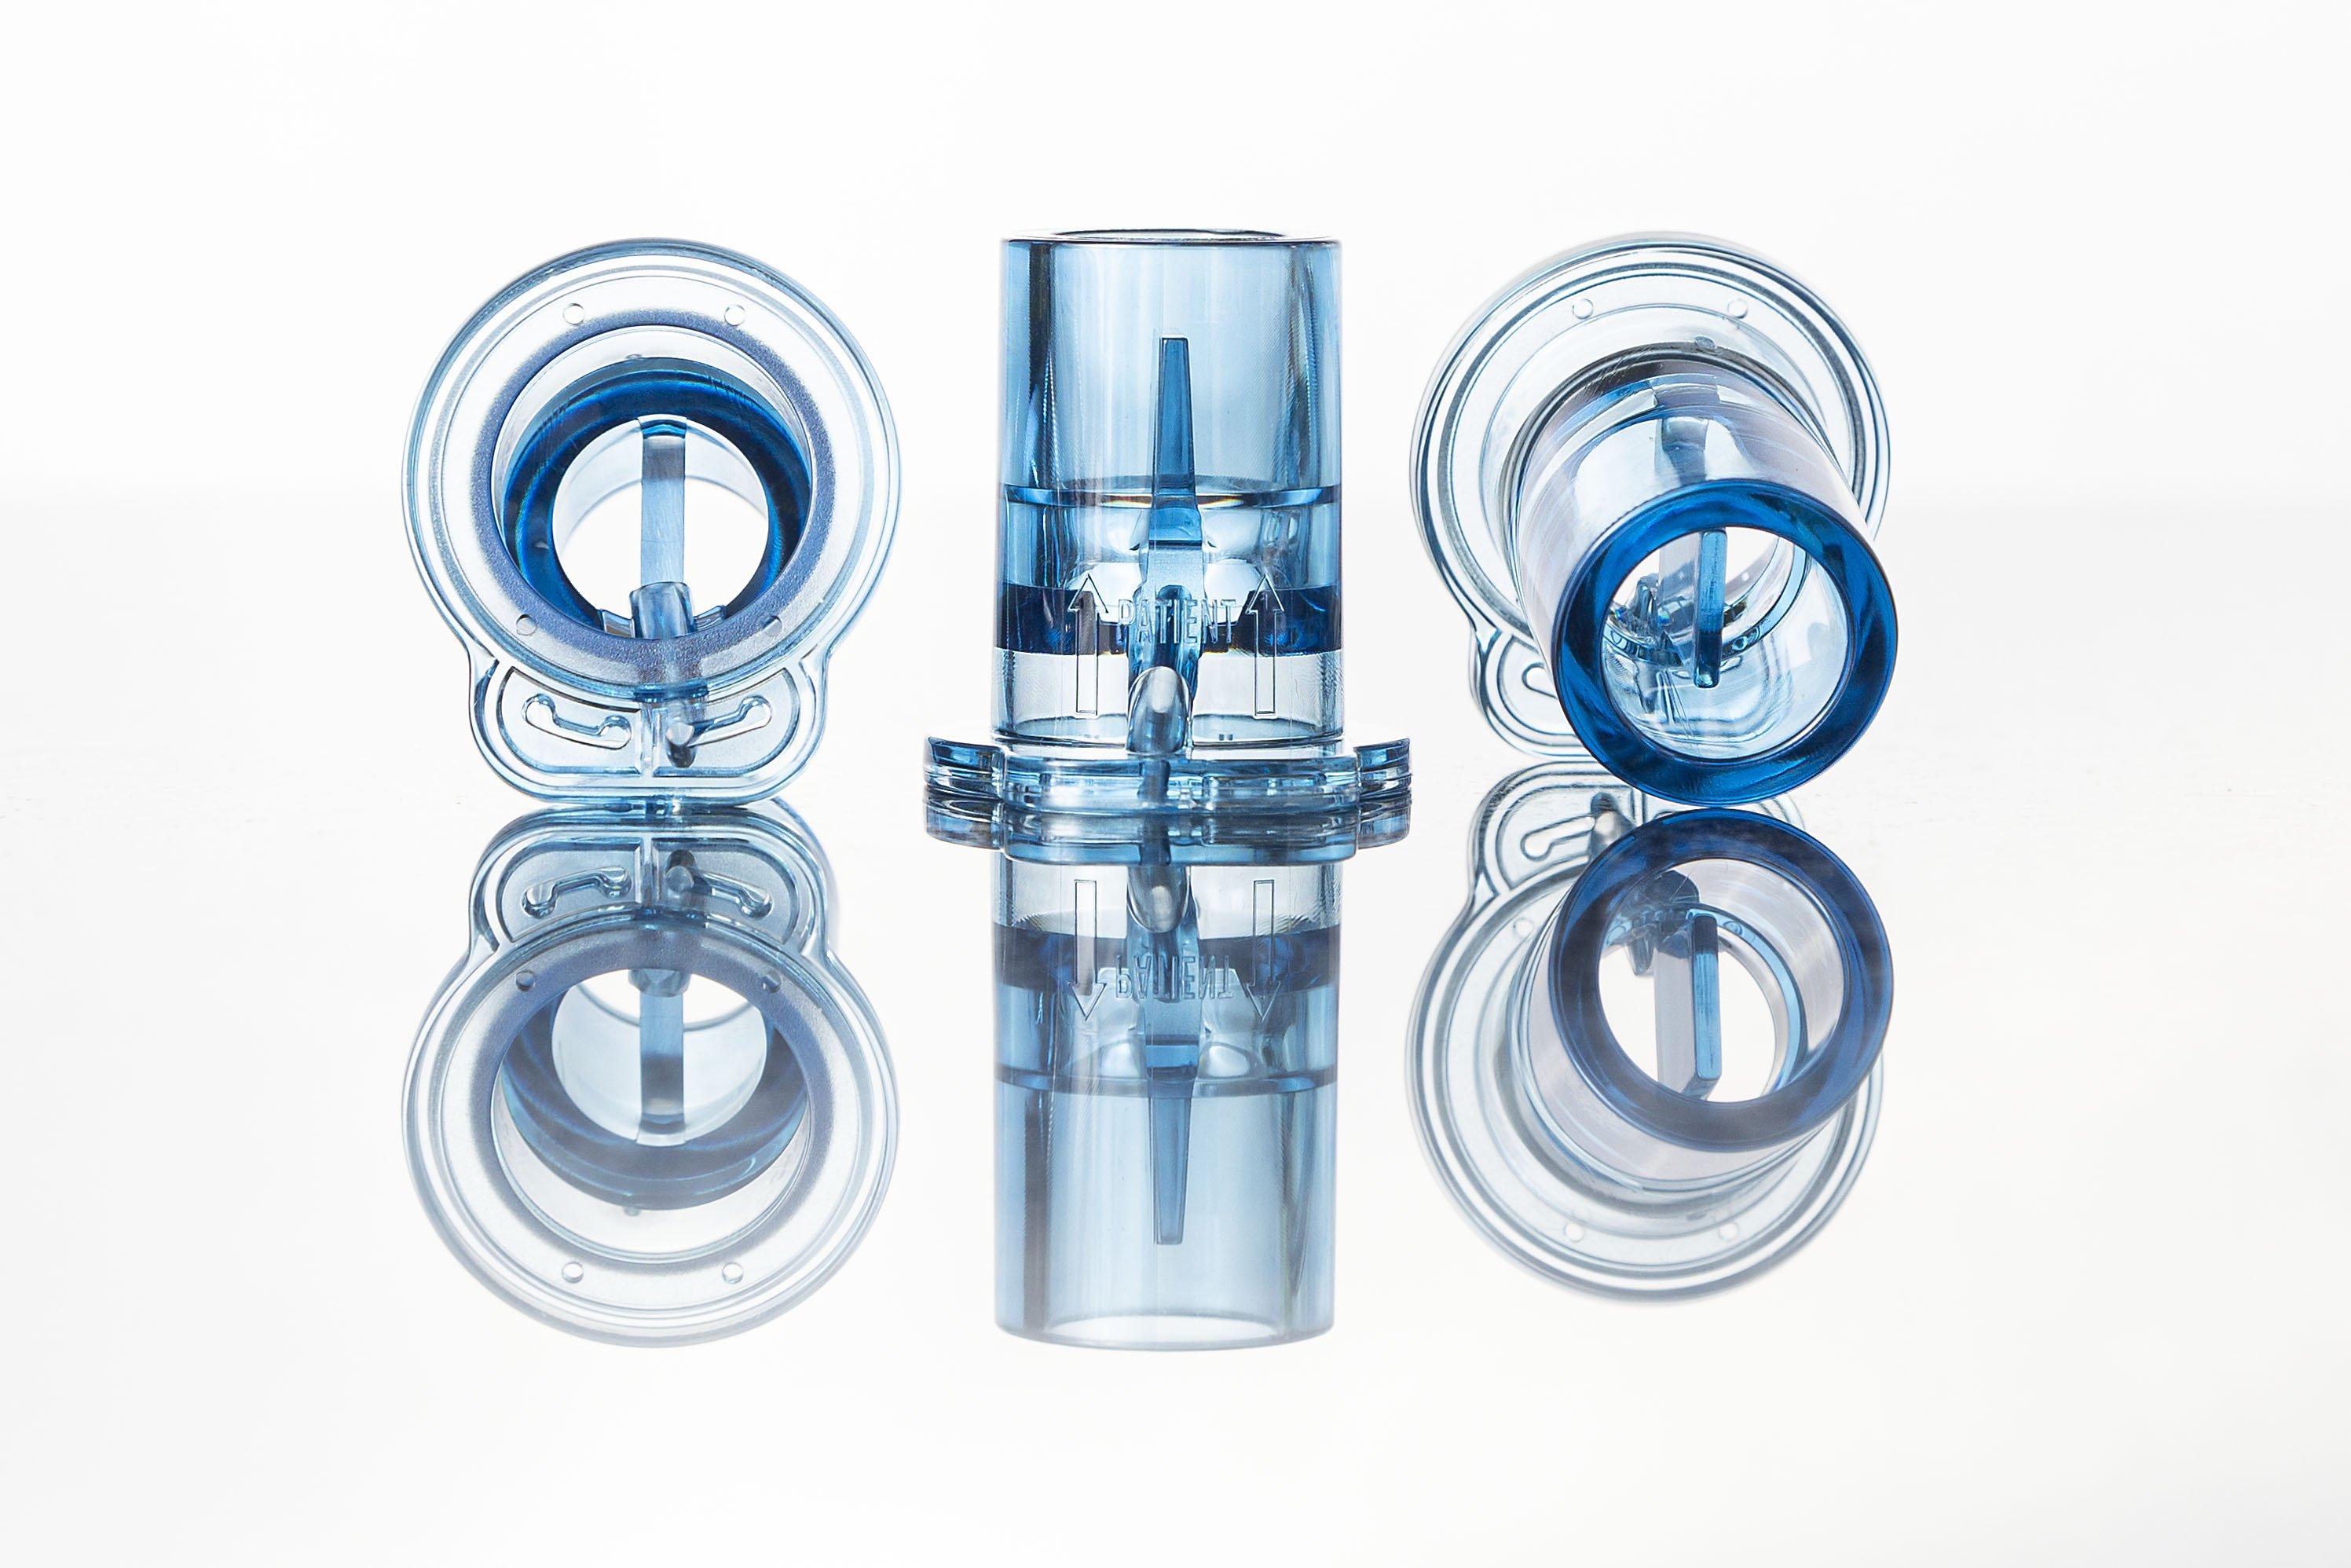 Plastica per settore medicale